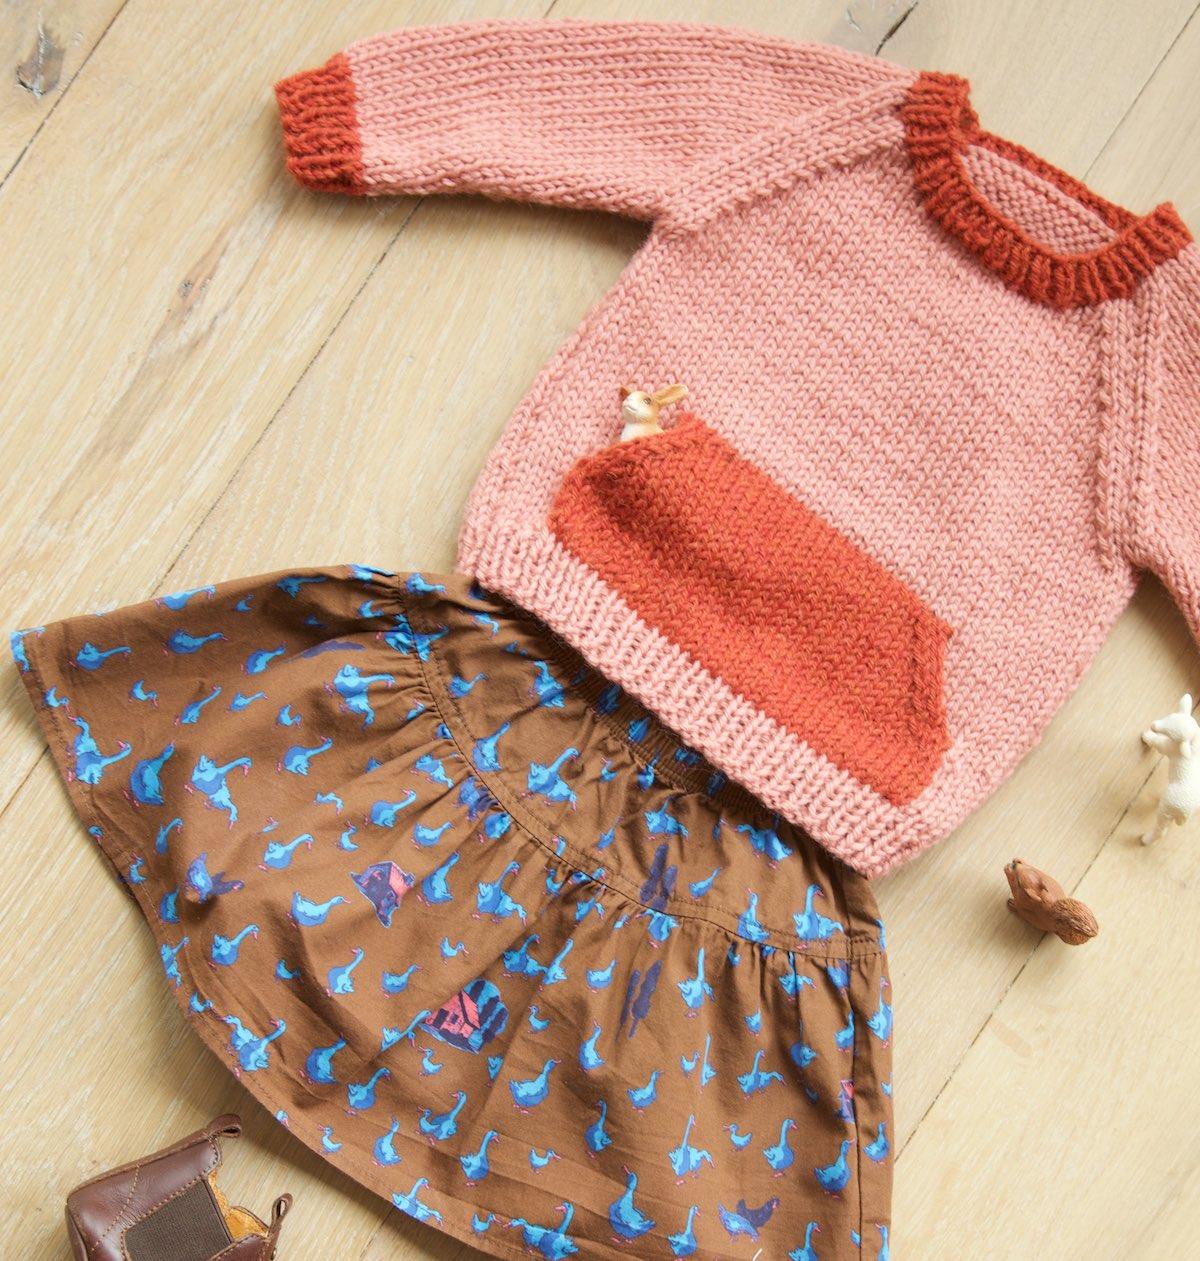 Quokka Sweater knitting pattern for kids